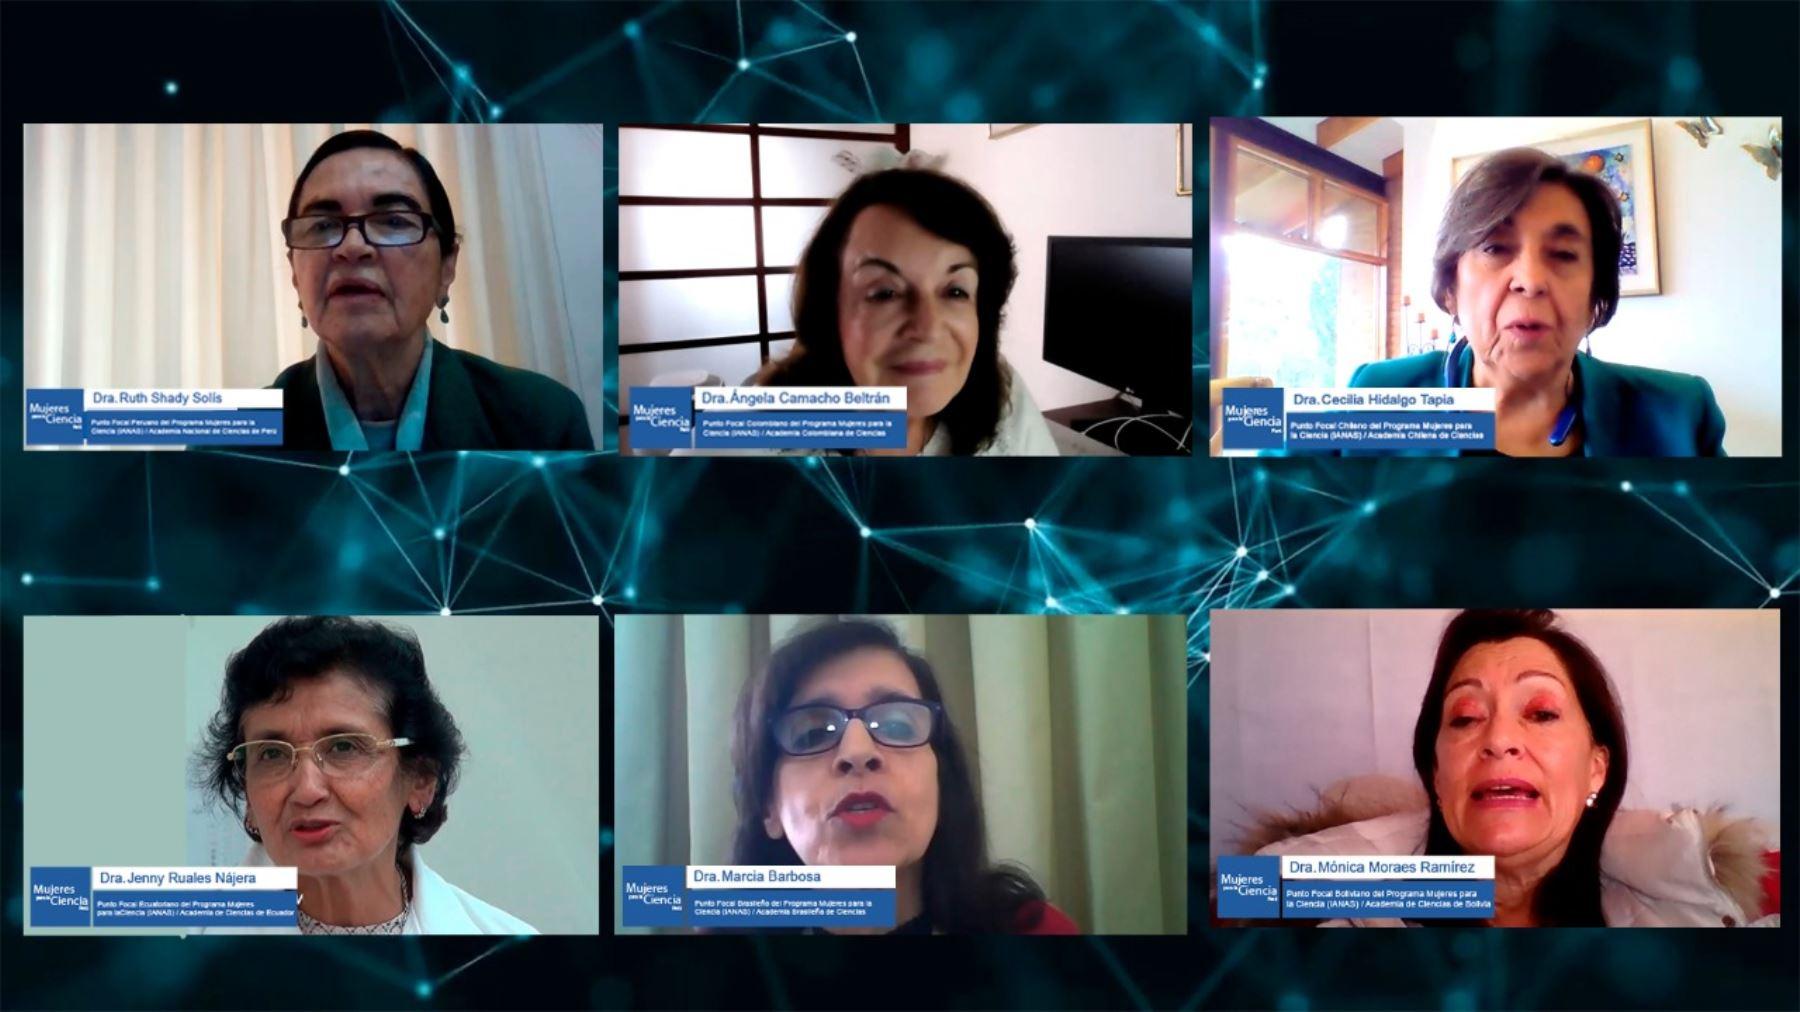 Caral: investigadoras se unen para empoderar a mujeres científicas de macrorregión norte